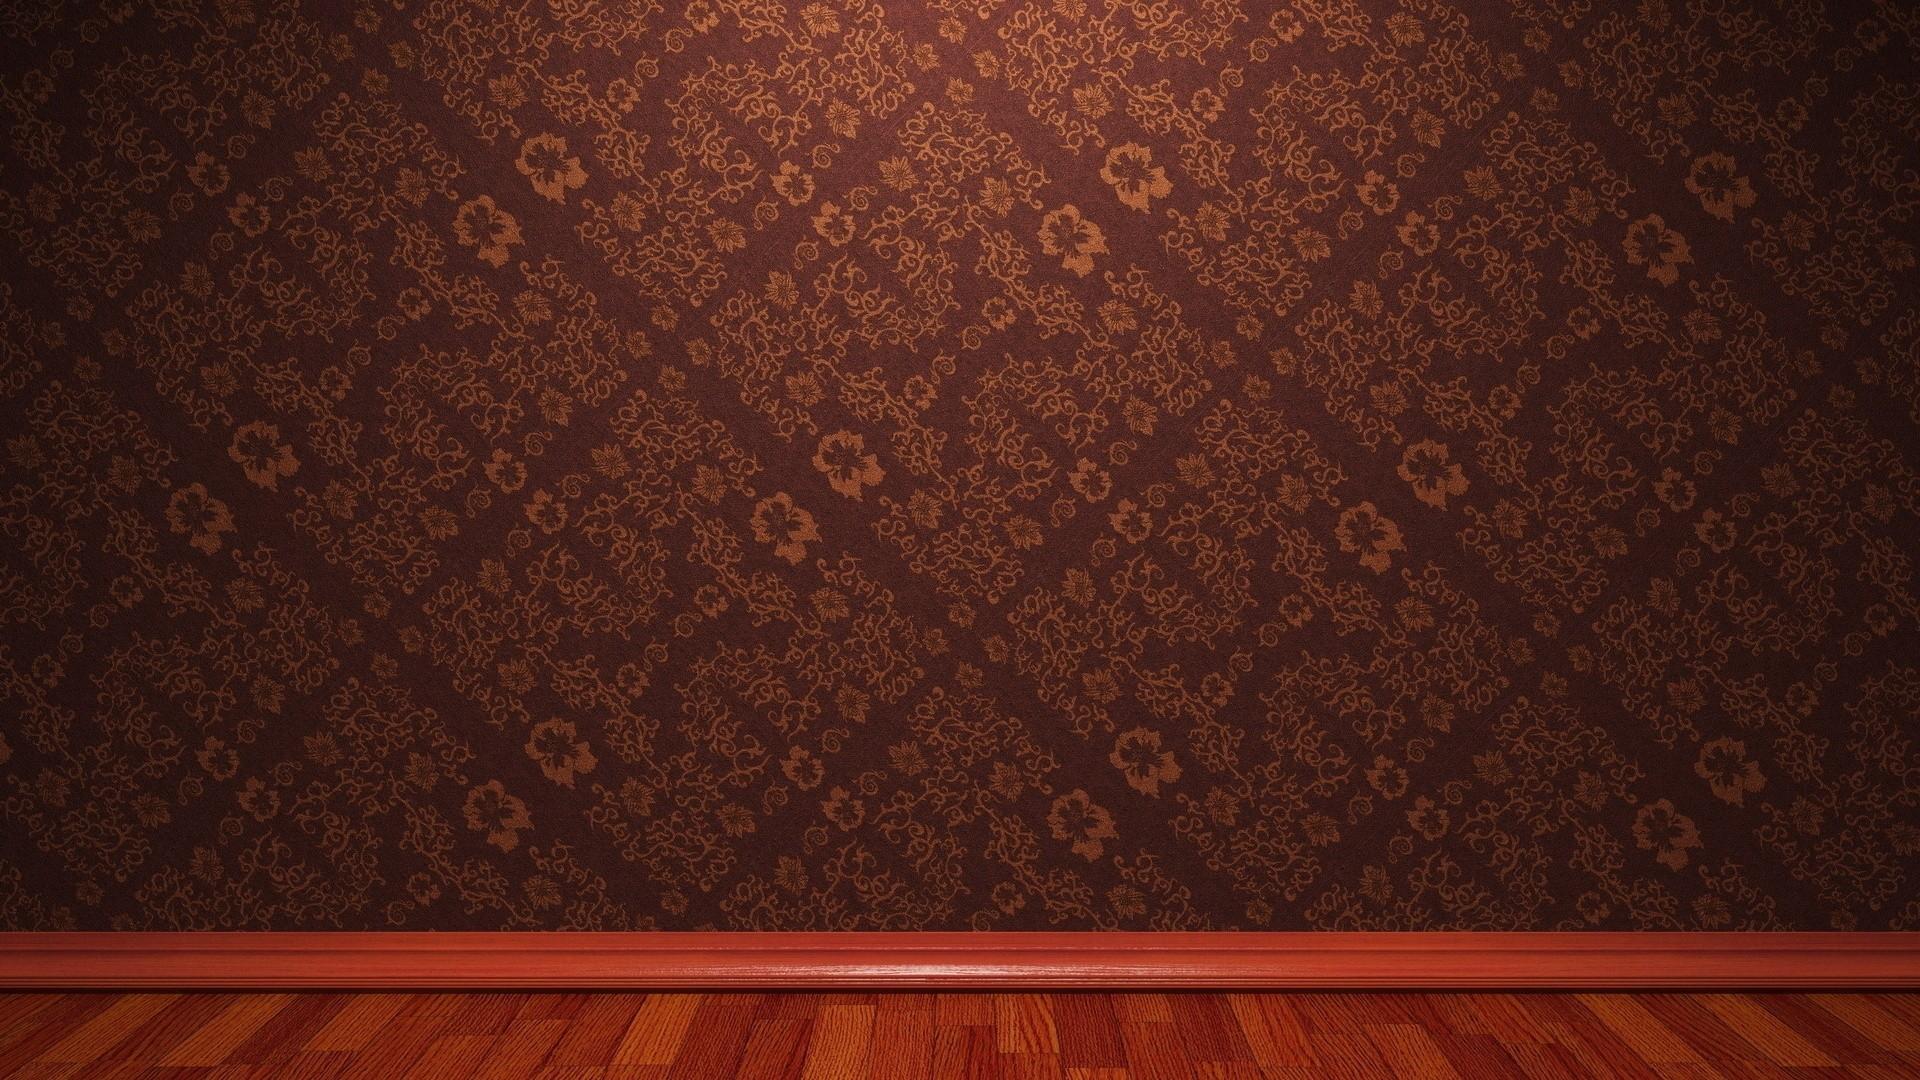 background, texture, grid · background, texture, wallpaper